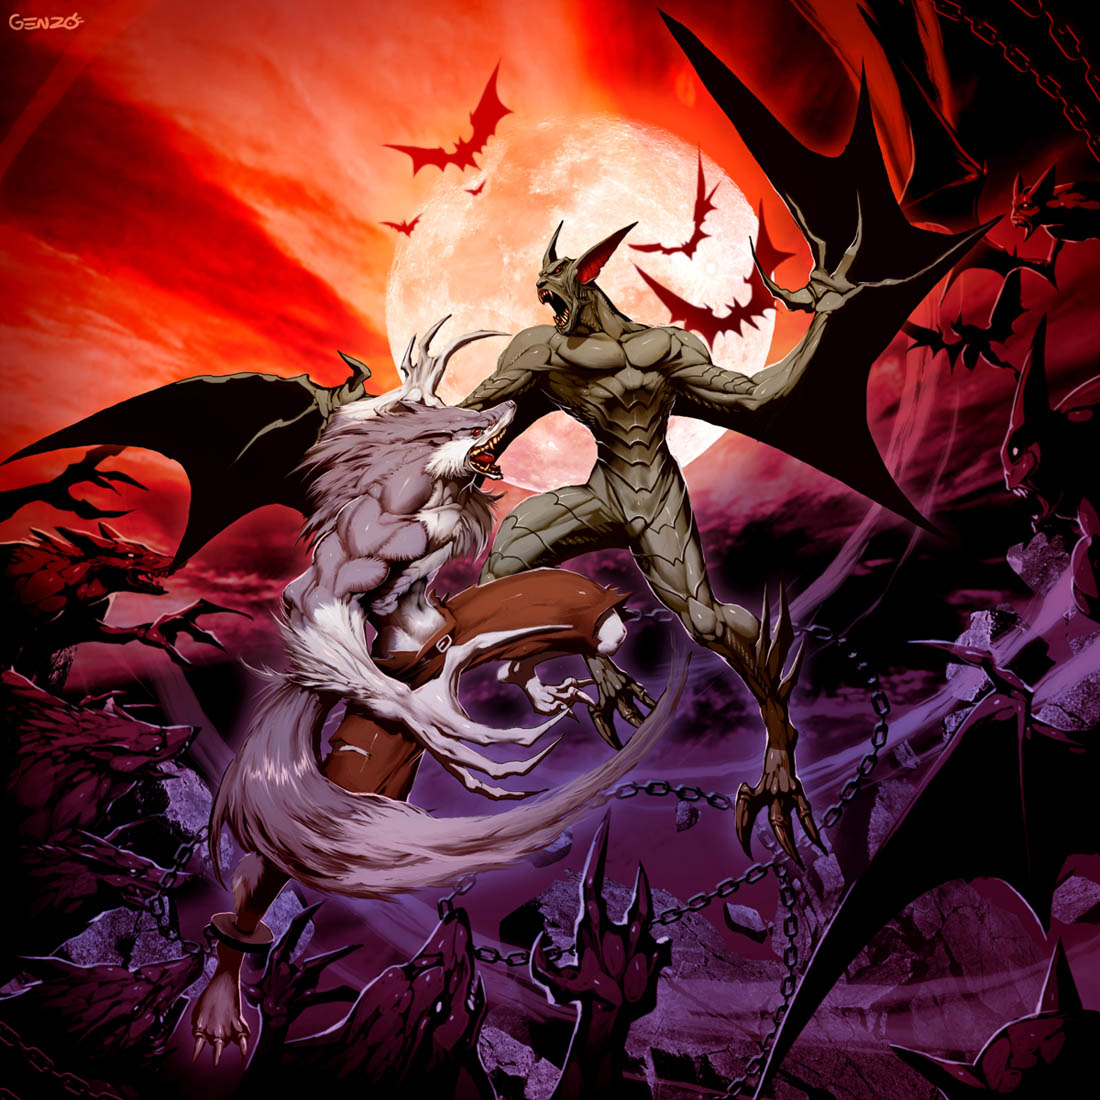 Drawn wolfman human love Vampire VS GENZOMAN on Werewolf